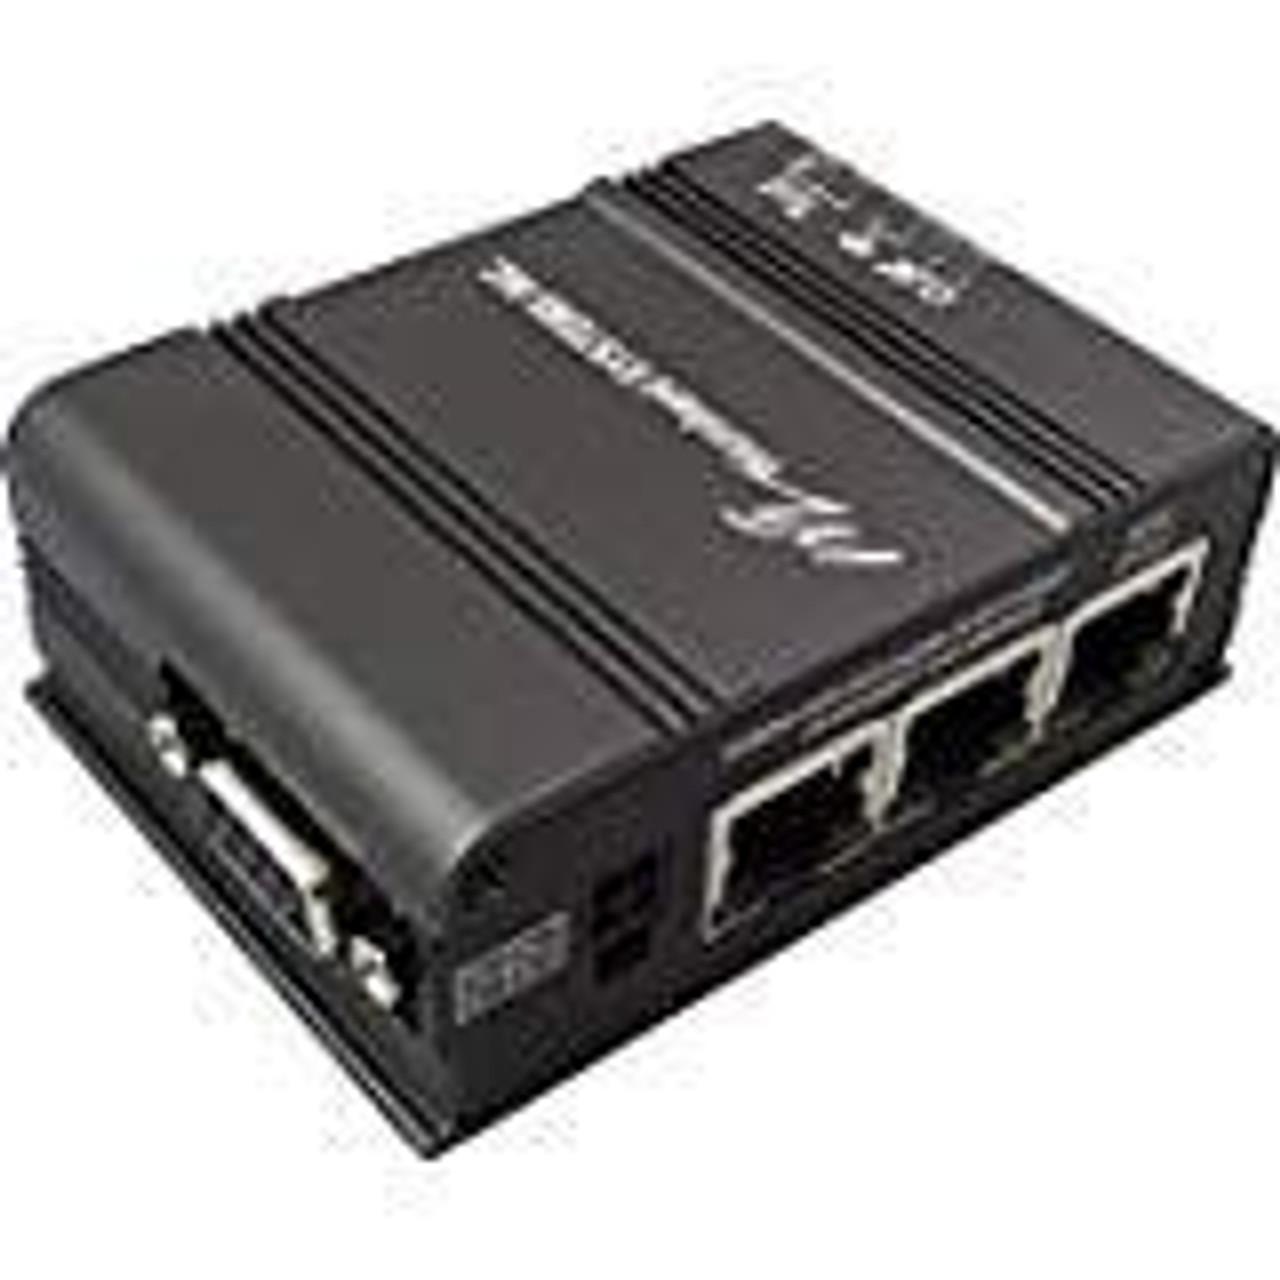 MicroHard Systems BULLETPLUS-NA LTE-Dual SIM WiFi ETHERNET Cellular Gateway | AC Version 1 | CMO Inc